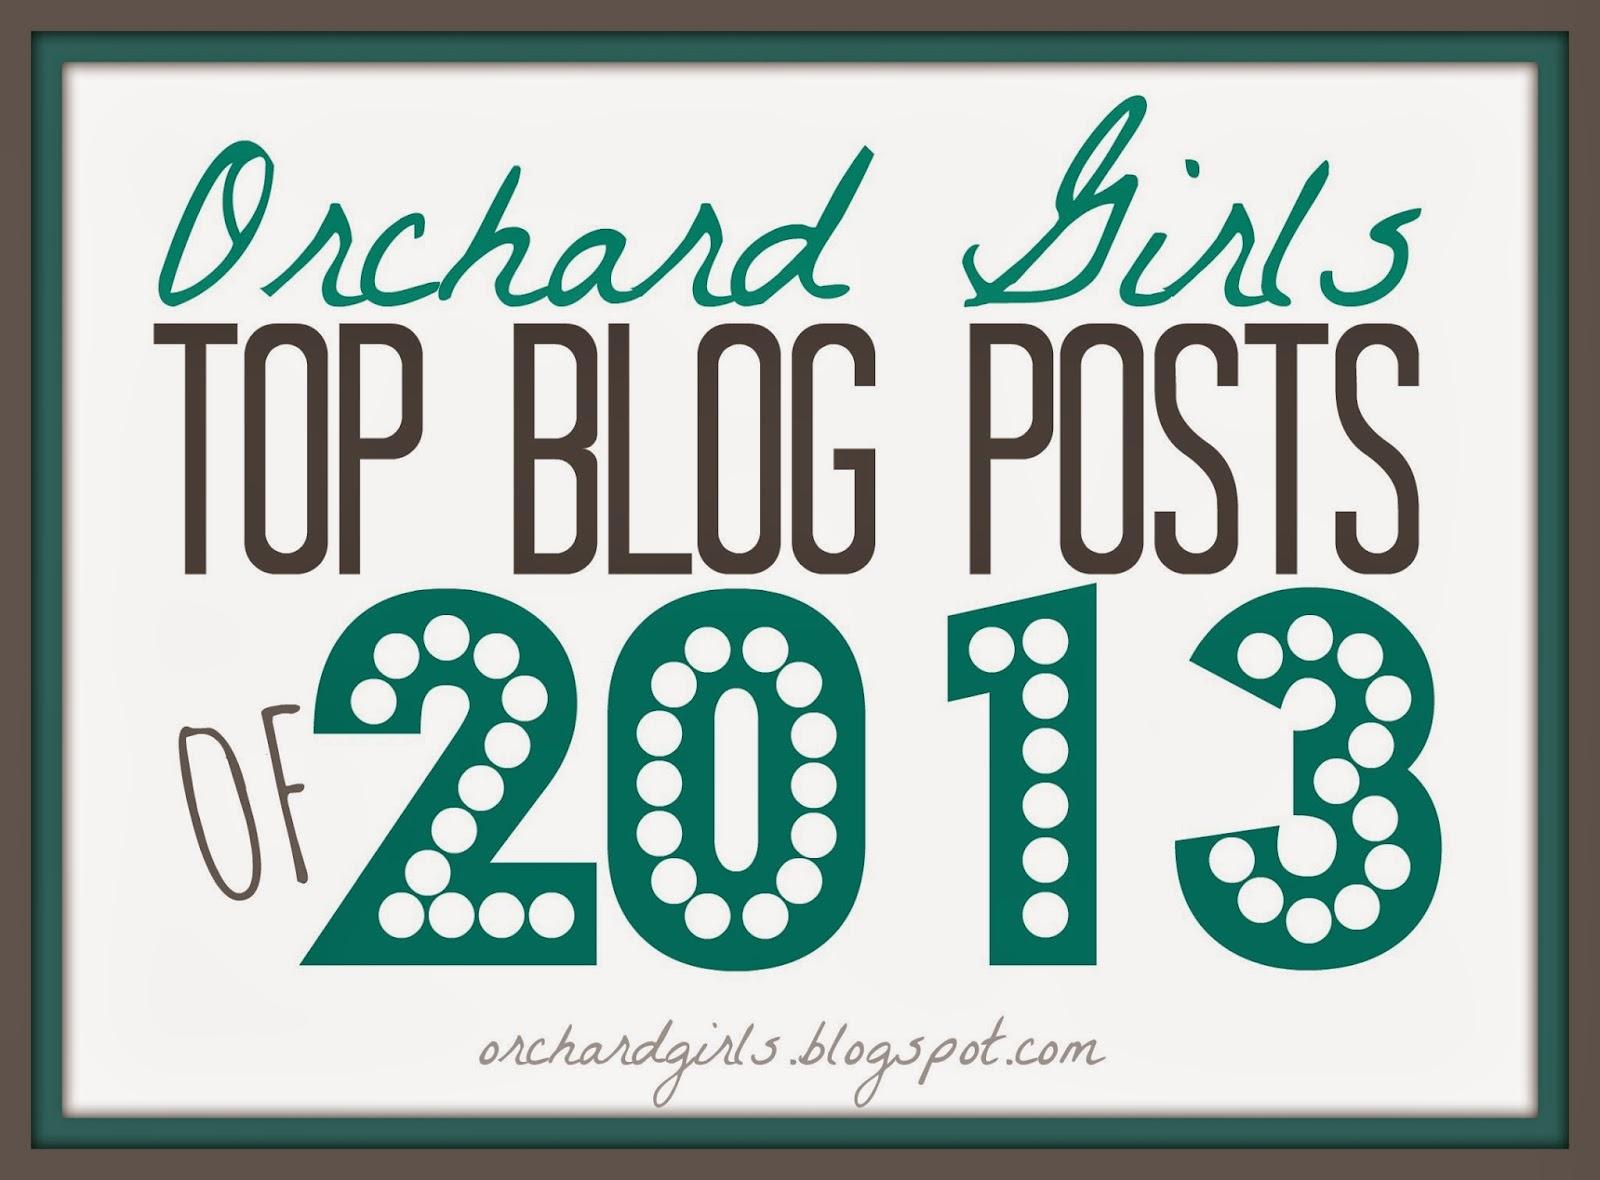 Top Blog Posts of 2013 by Orchardgirls.blogspot.com